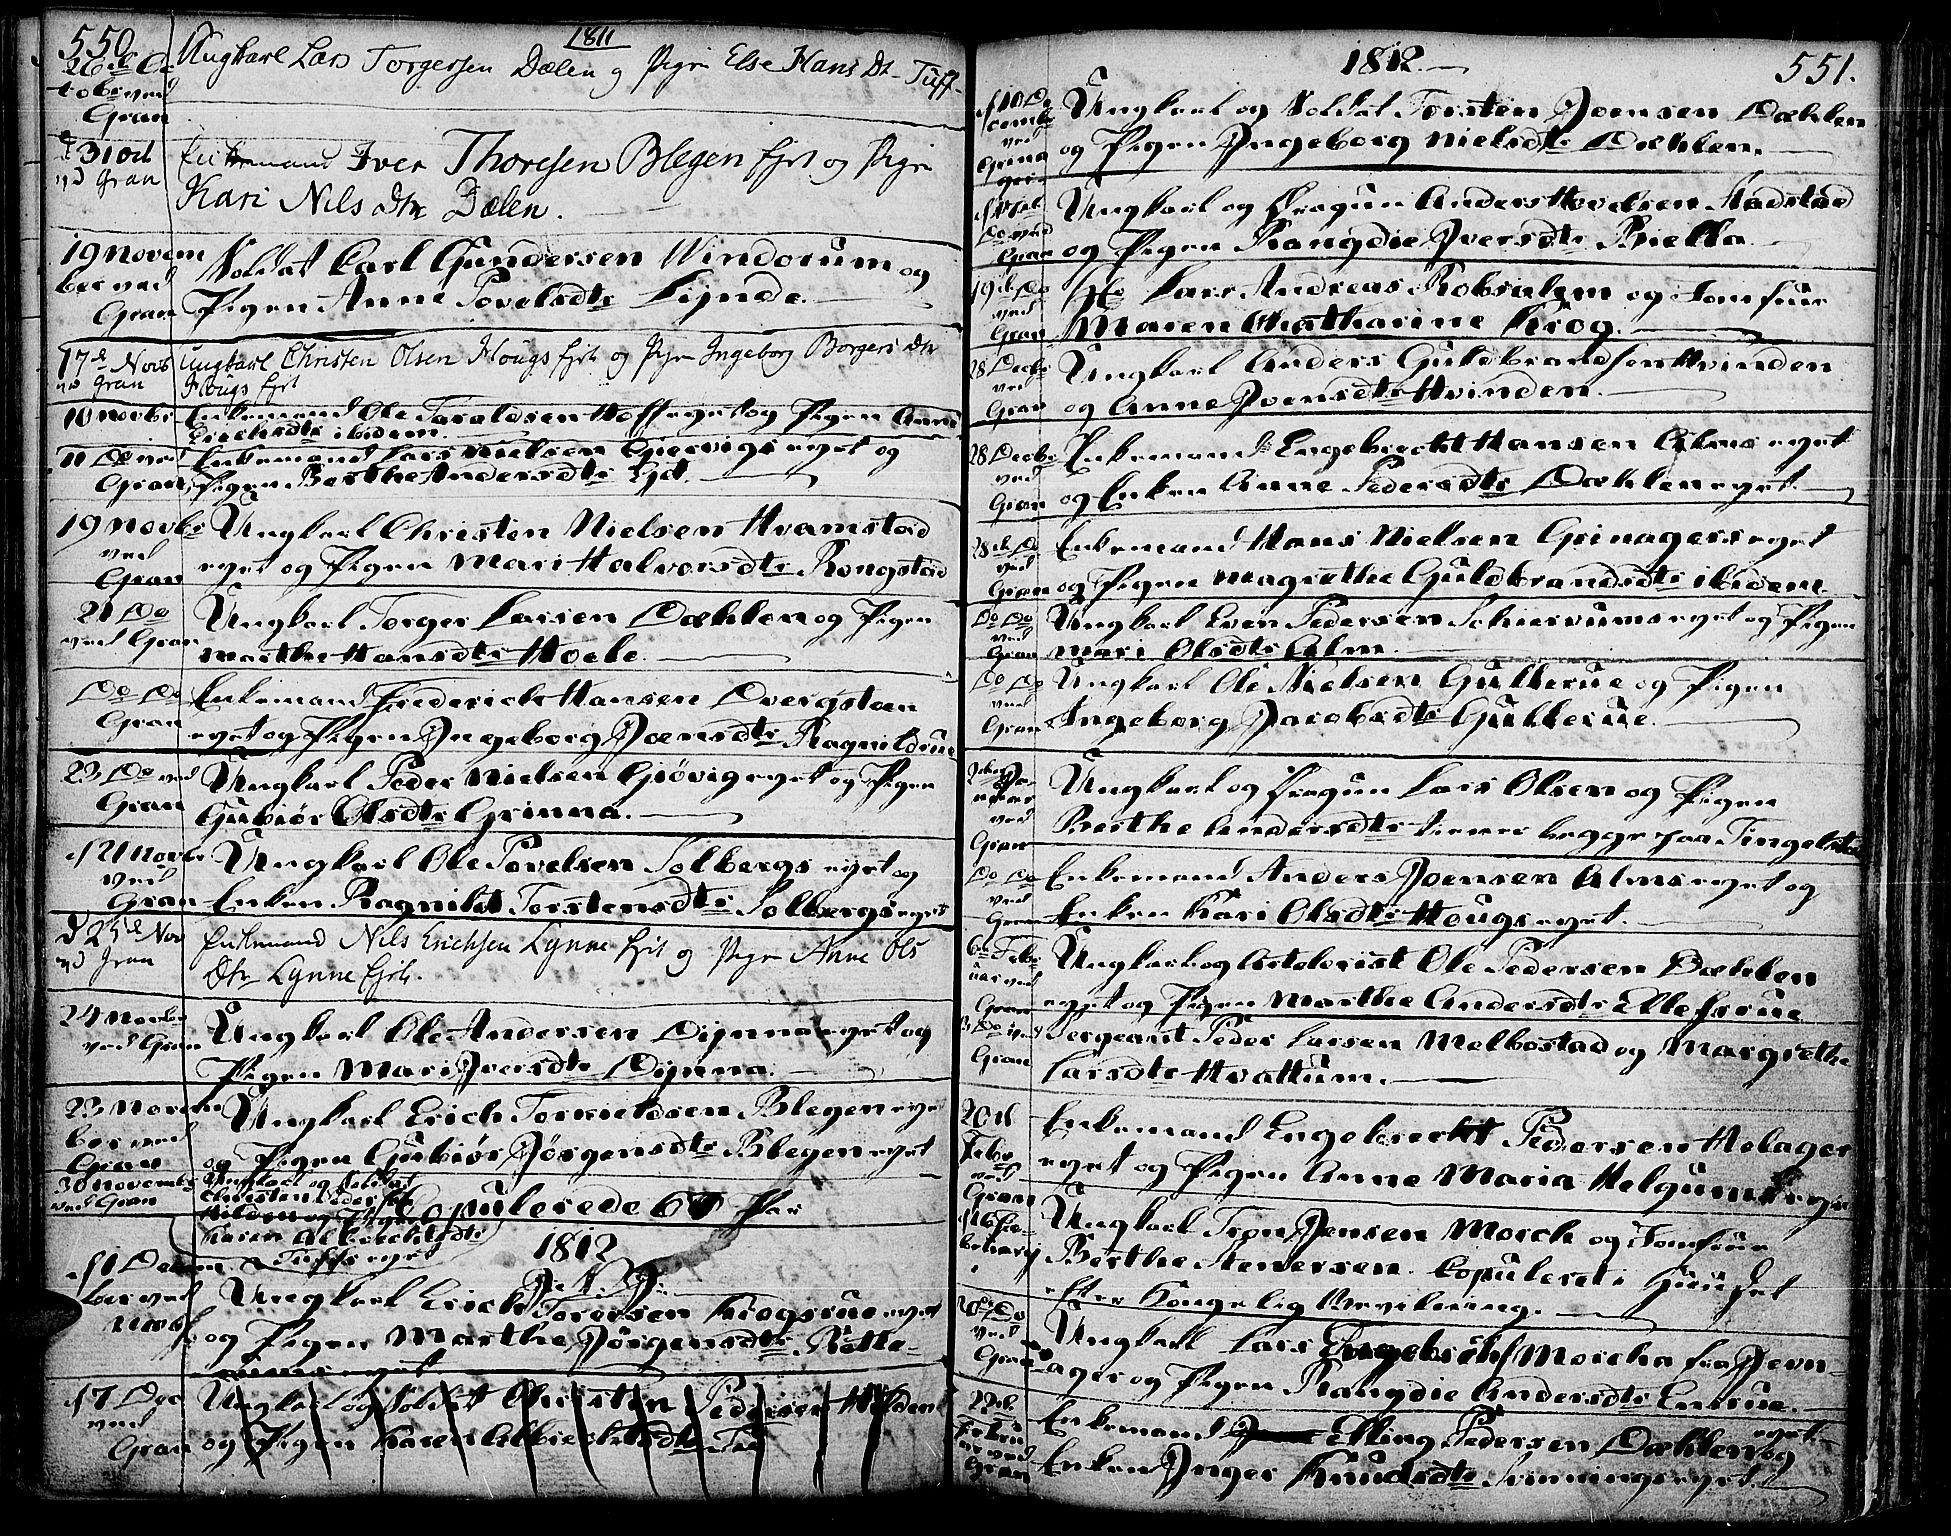 SAH, Gran prestekontor, Ministerialbok nr. 6, 1787-1824, s. 550-551